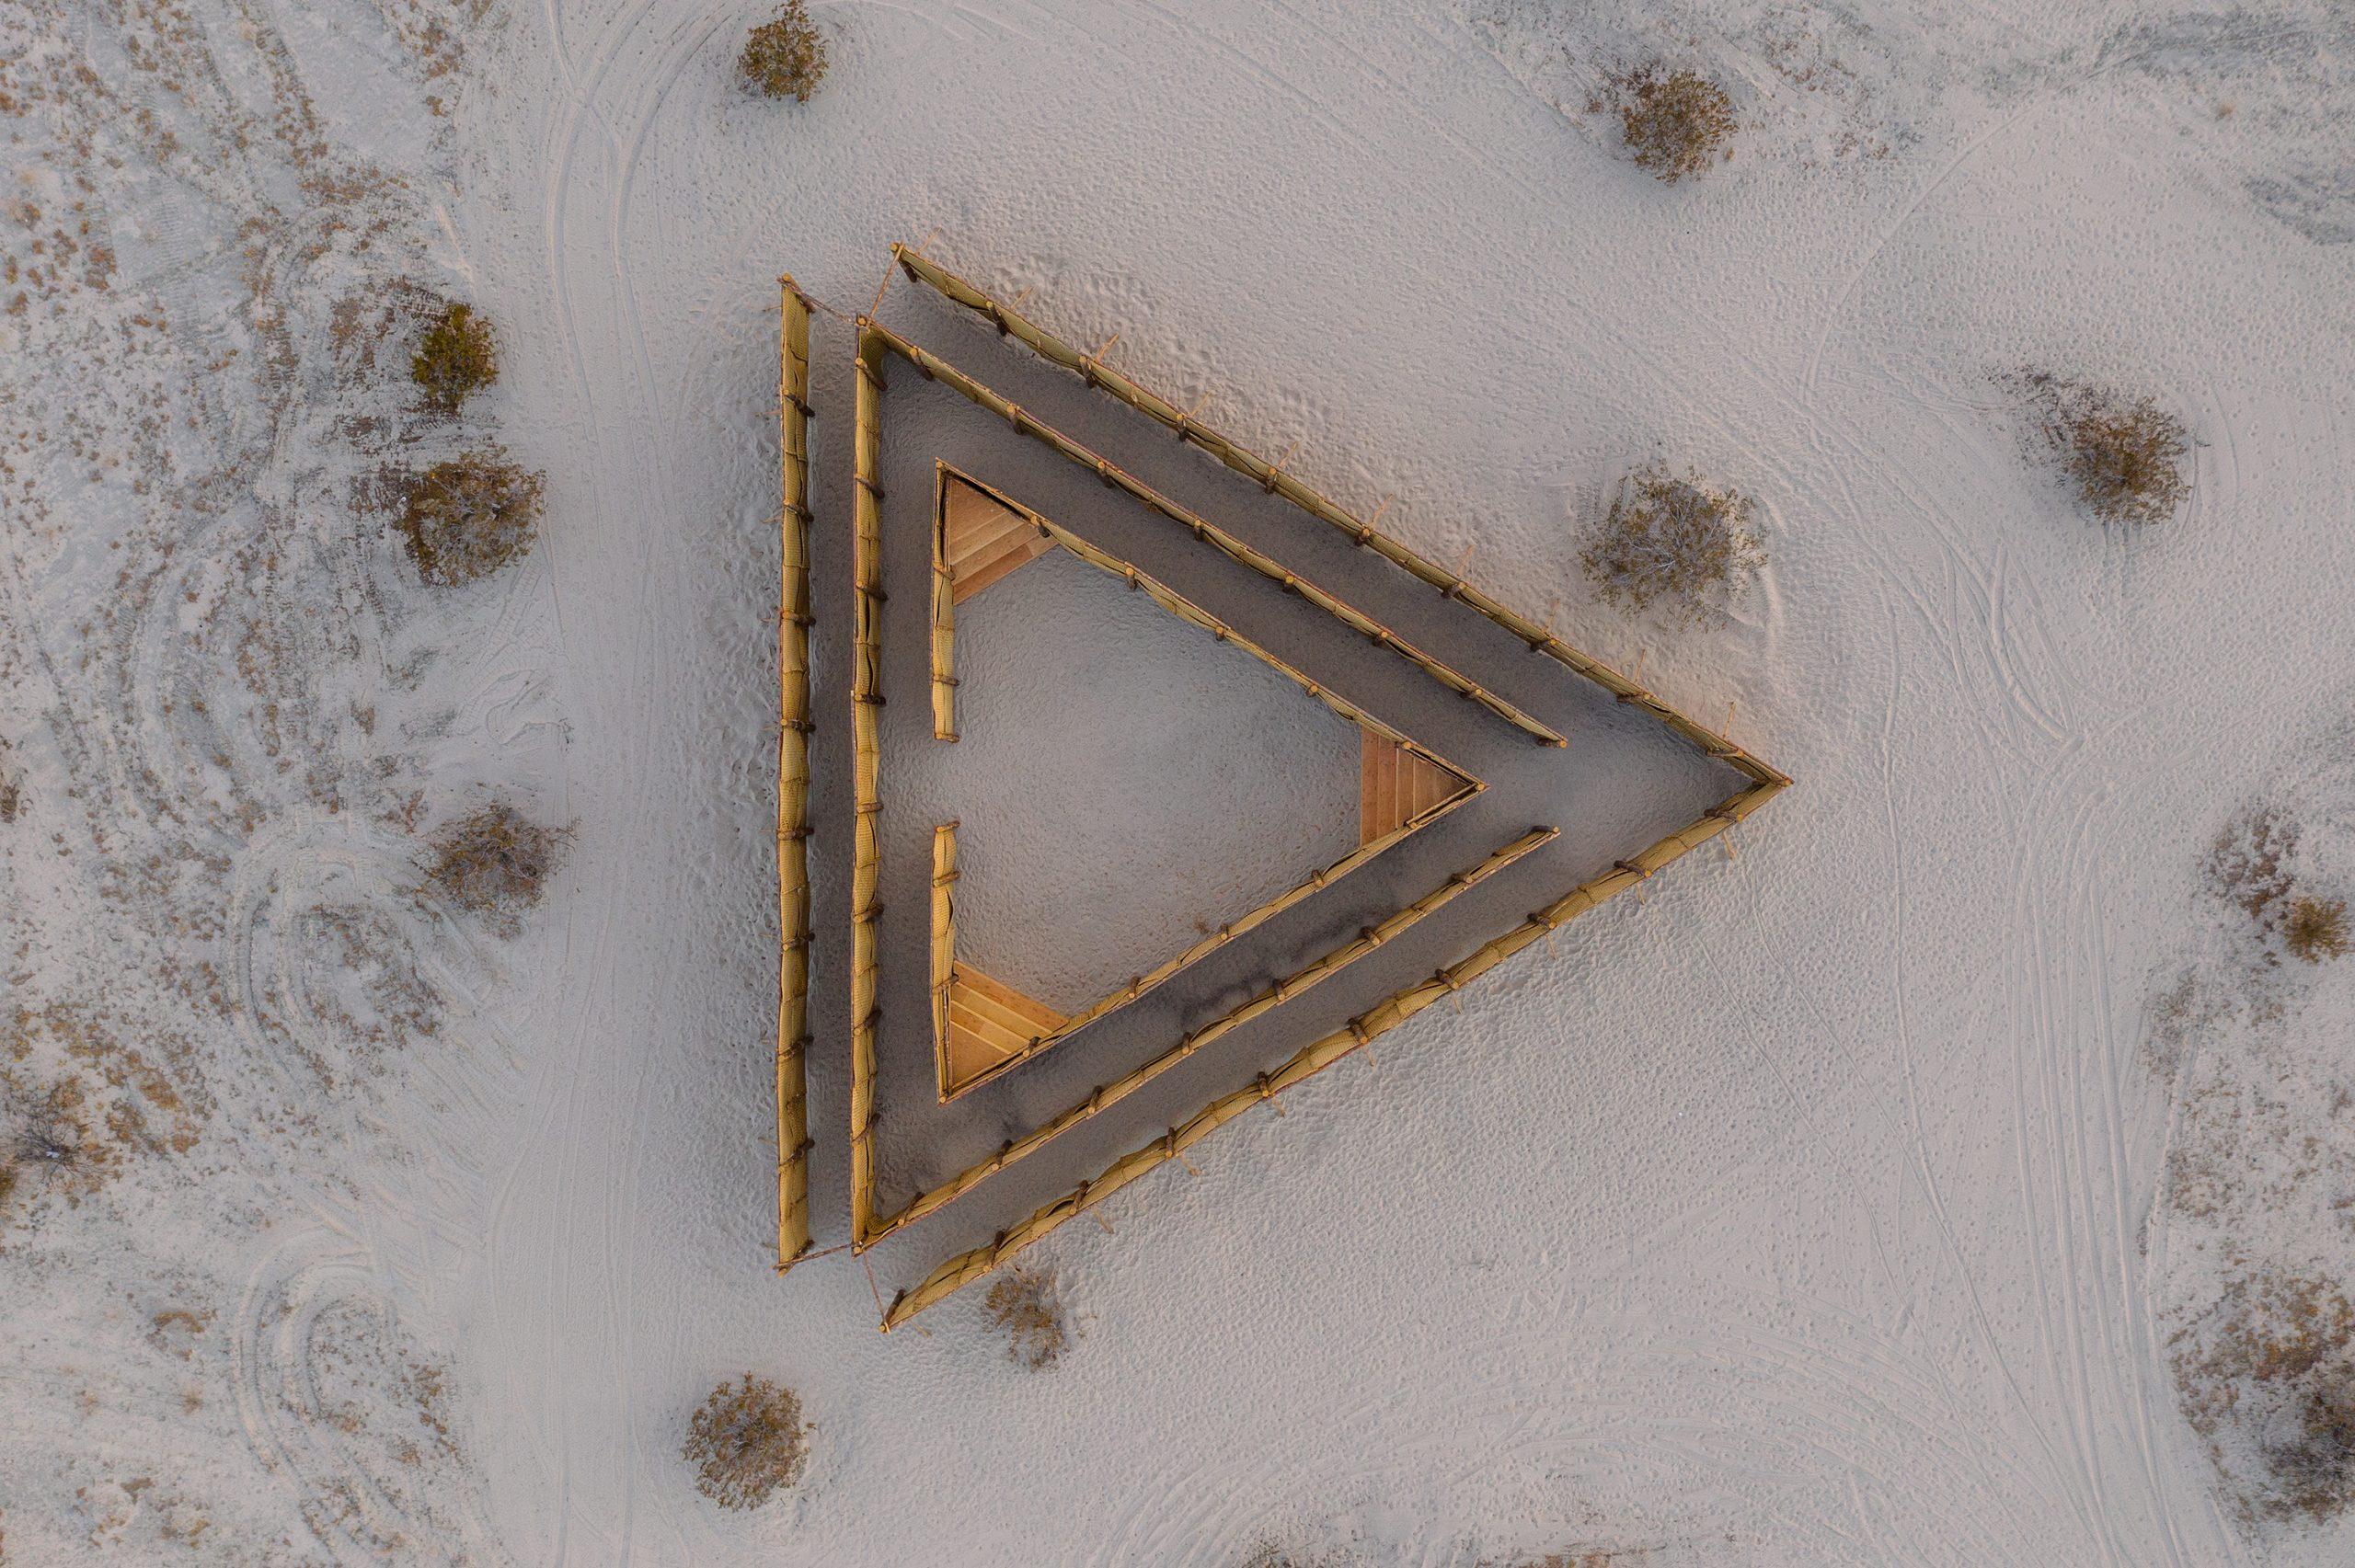 Desert X 21 - Coachella Valley. DX 2 Eduardo Sarabia - The Passenger. Photo by Lance Gerber.jpg